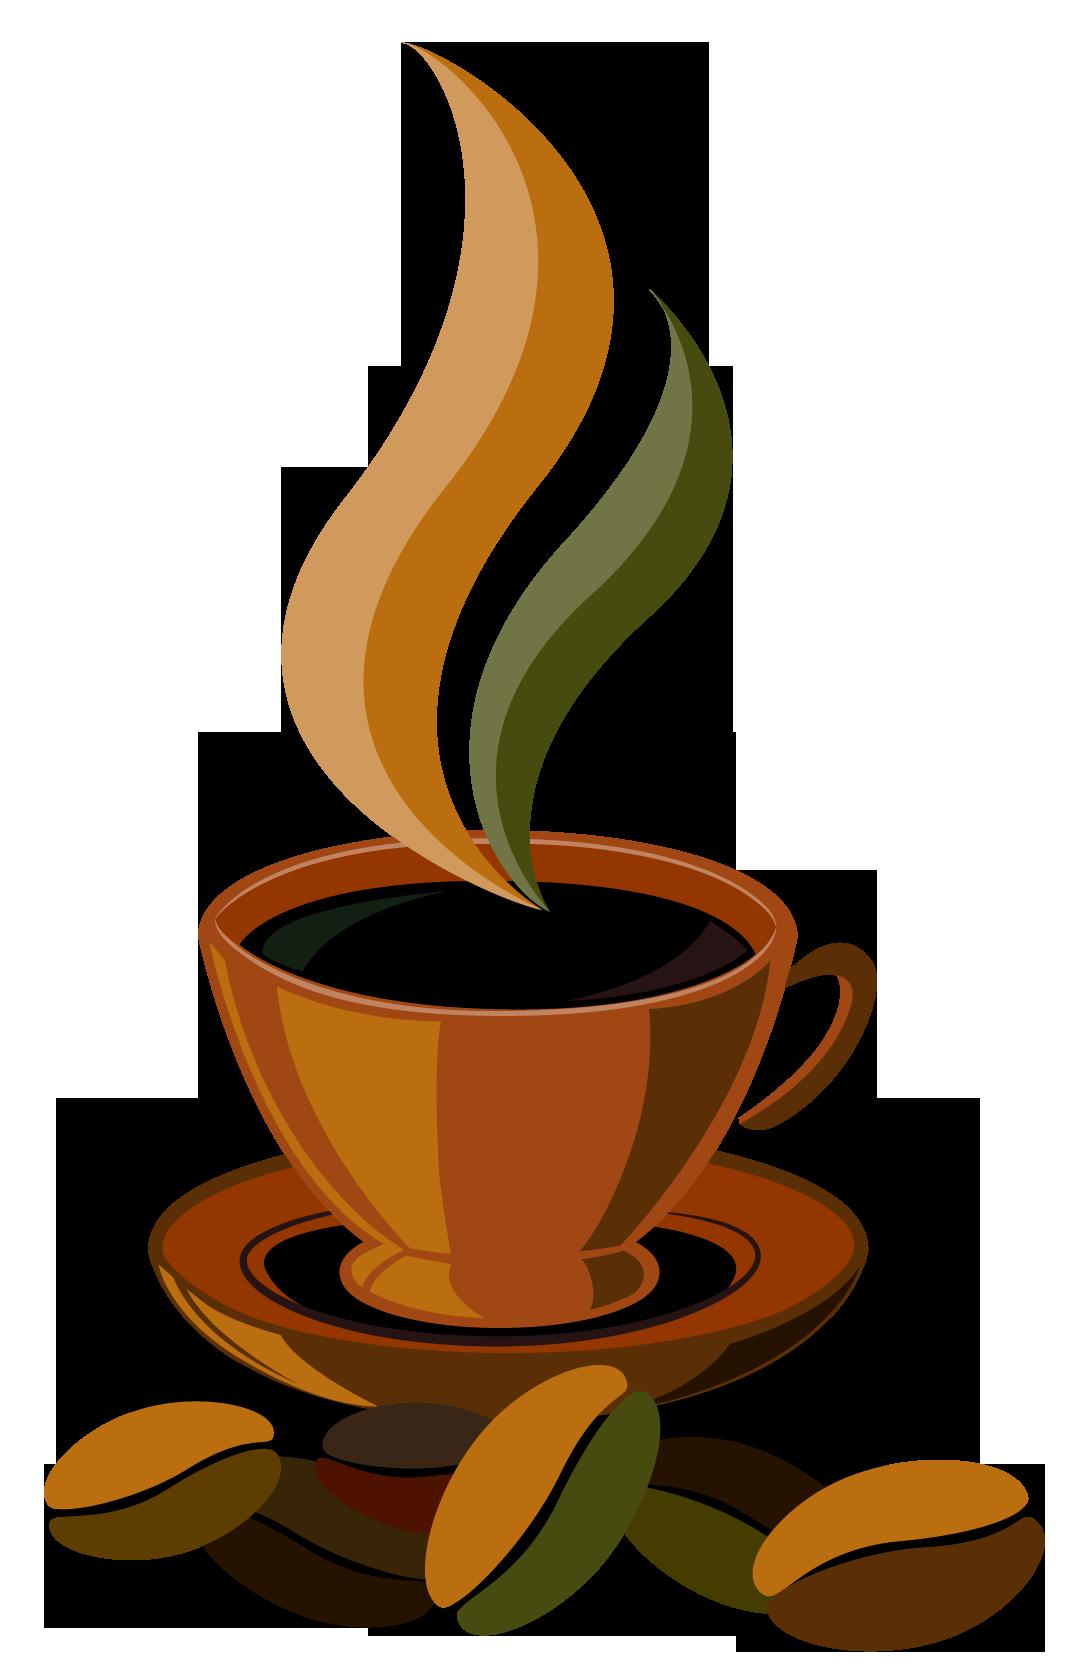 Intolerable acts clipart cup tea. Cafeteria transparent image png